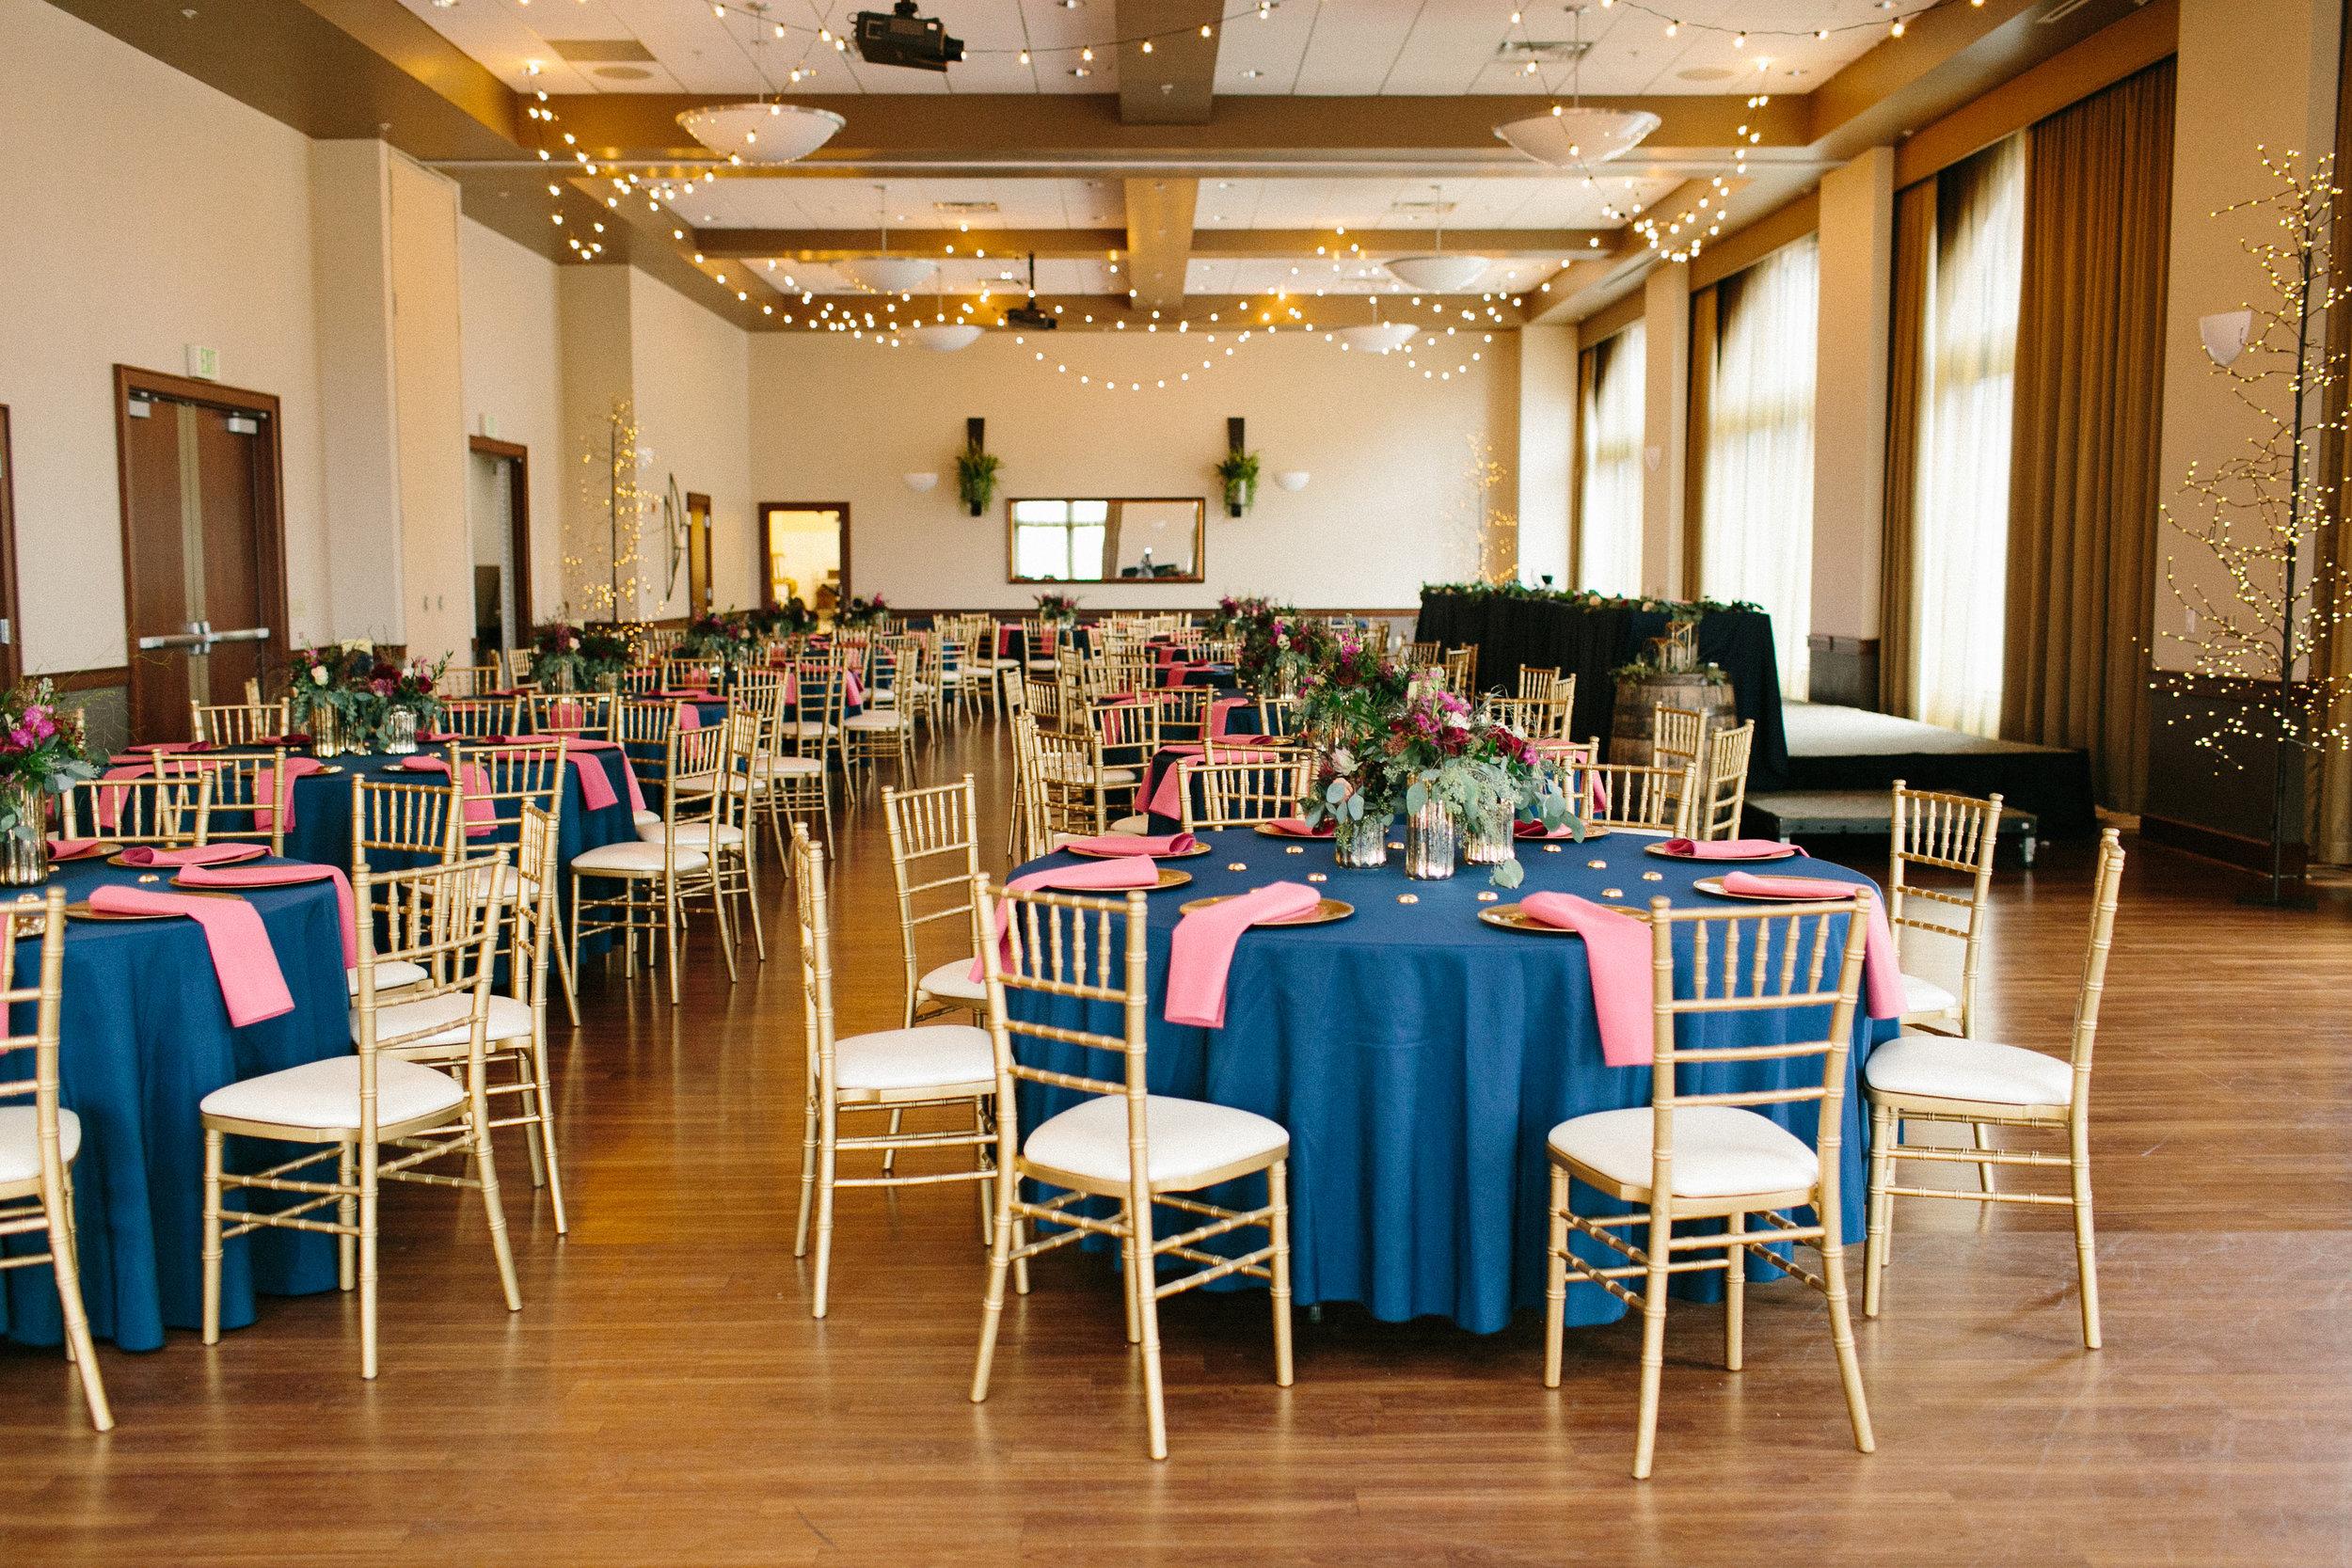 2017_Carly_Milbrath_Jefferson_Street_Inn_Wedding_Wausau_WI_006.JPG